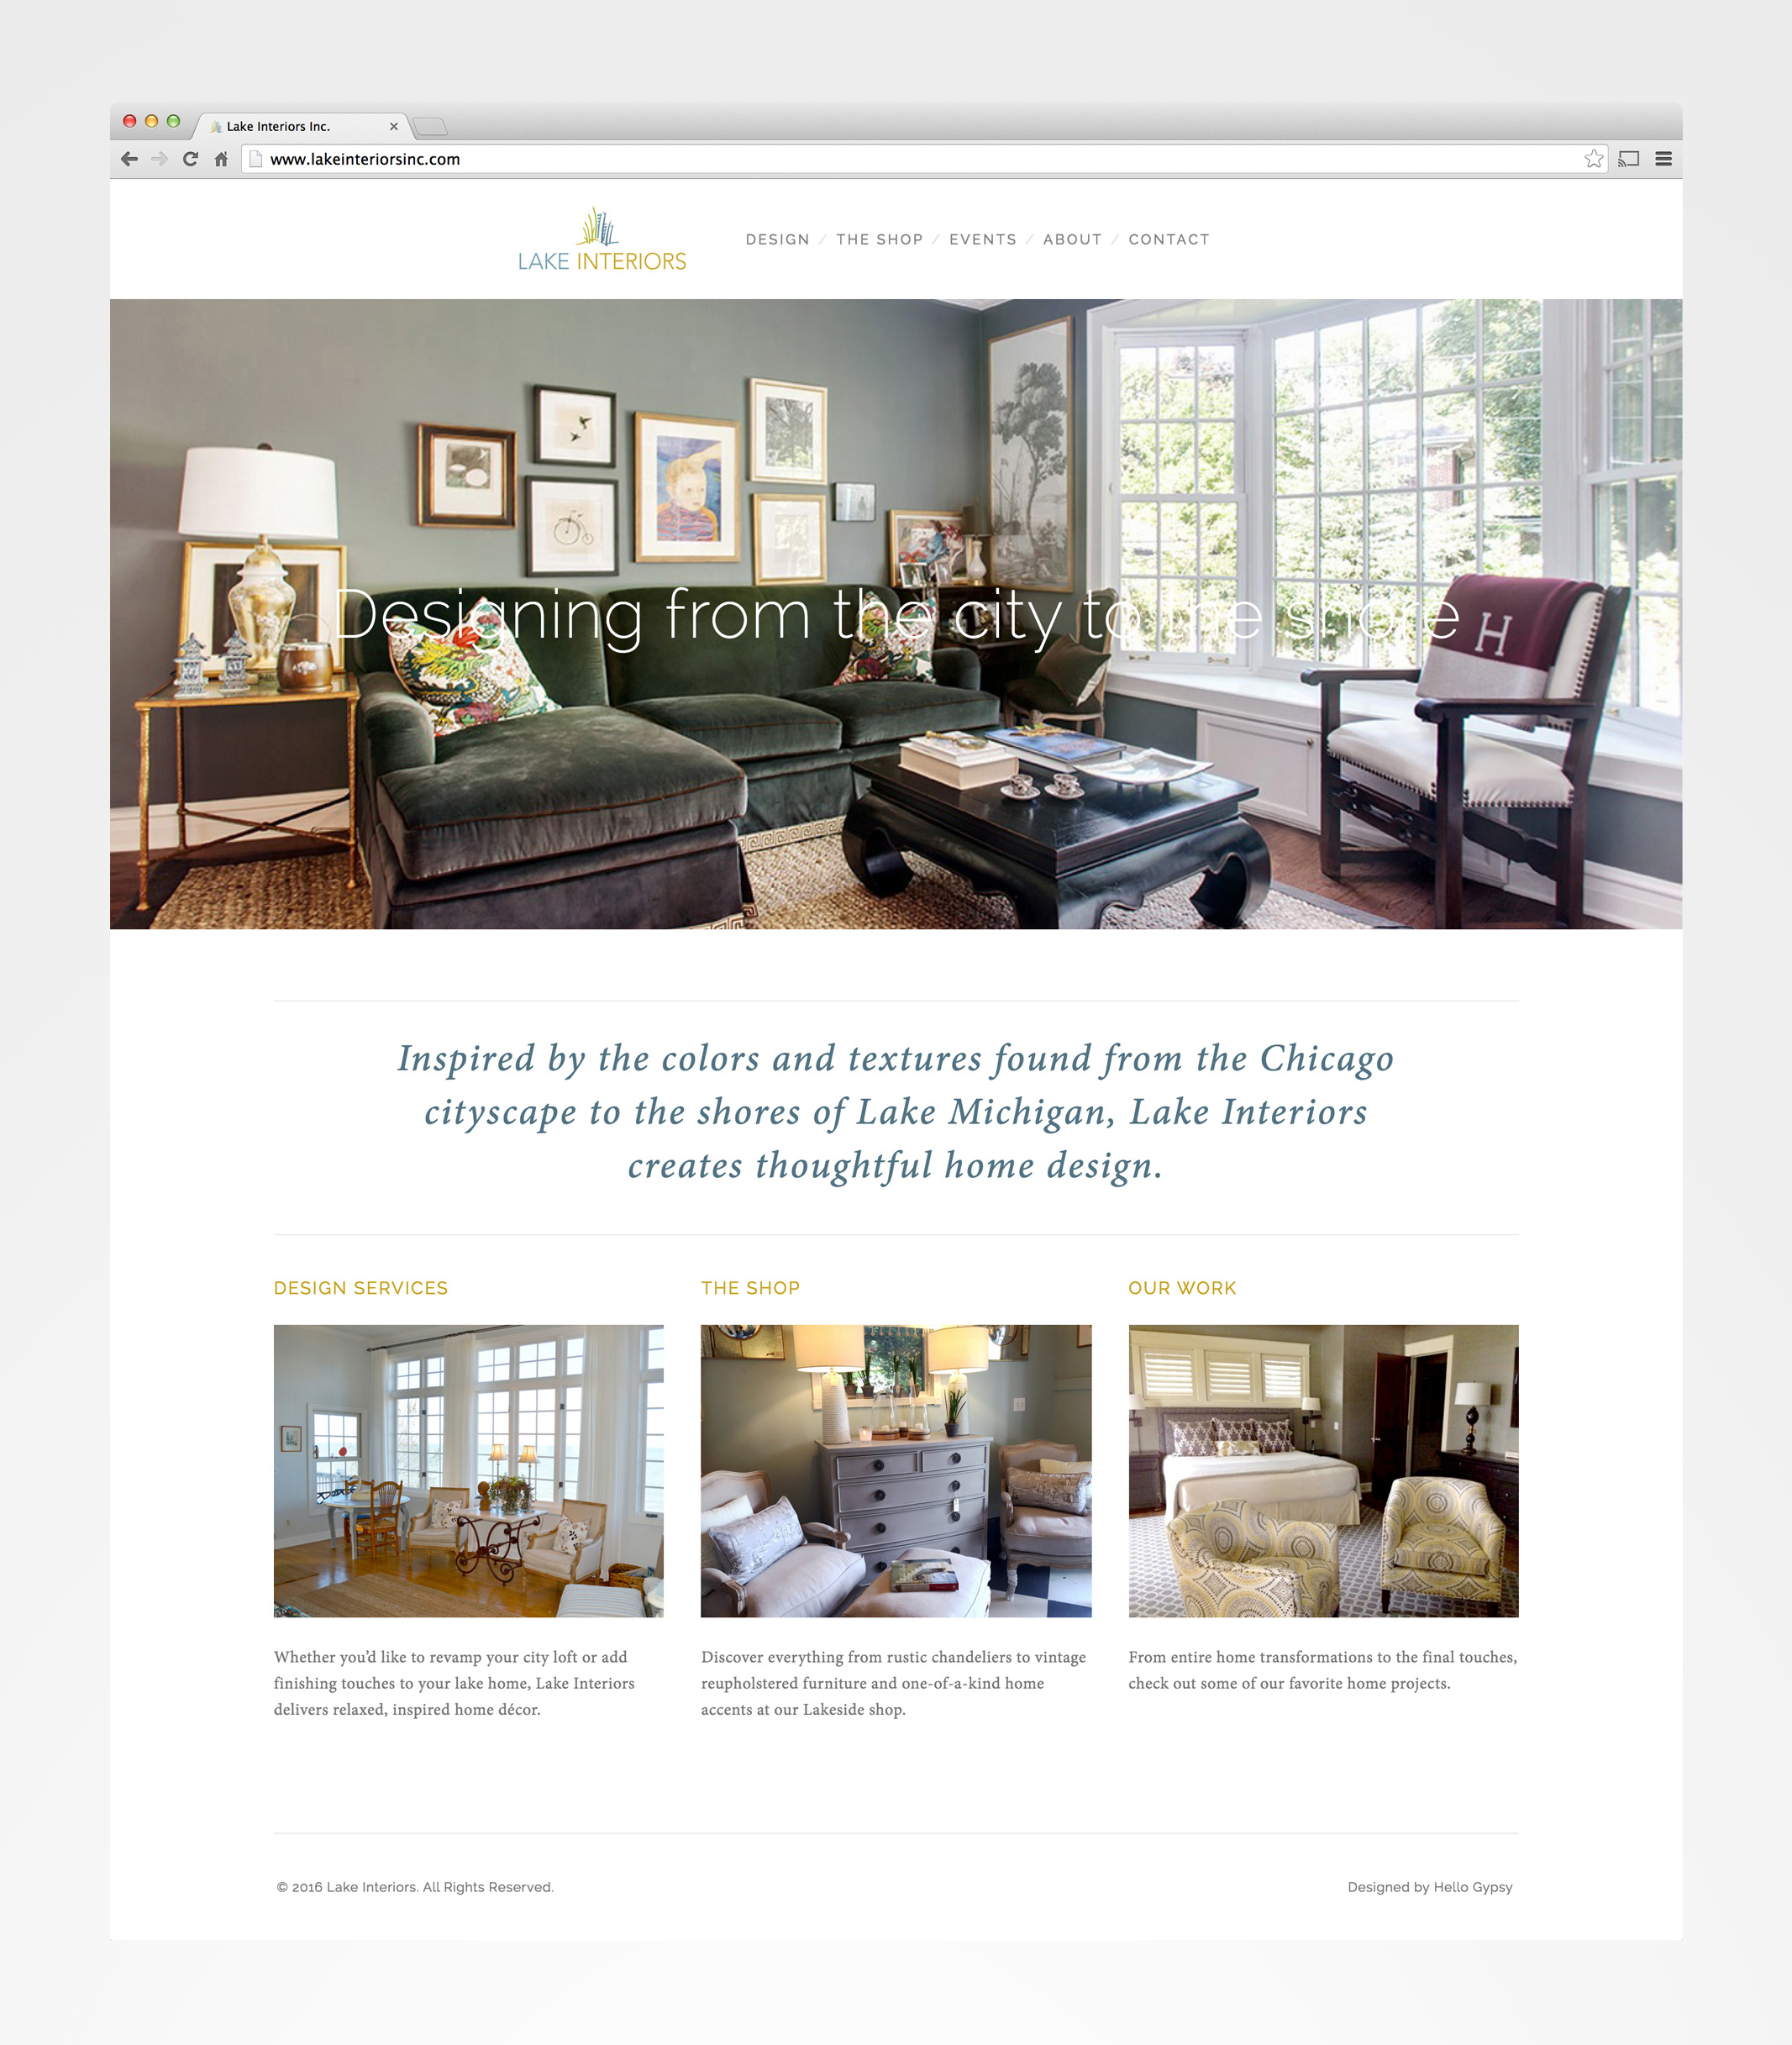 Lake+Interiors+branding+and+website+by+Hello+Gypsy+01.jpg